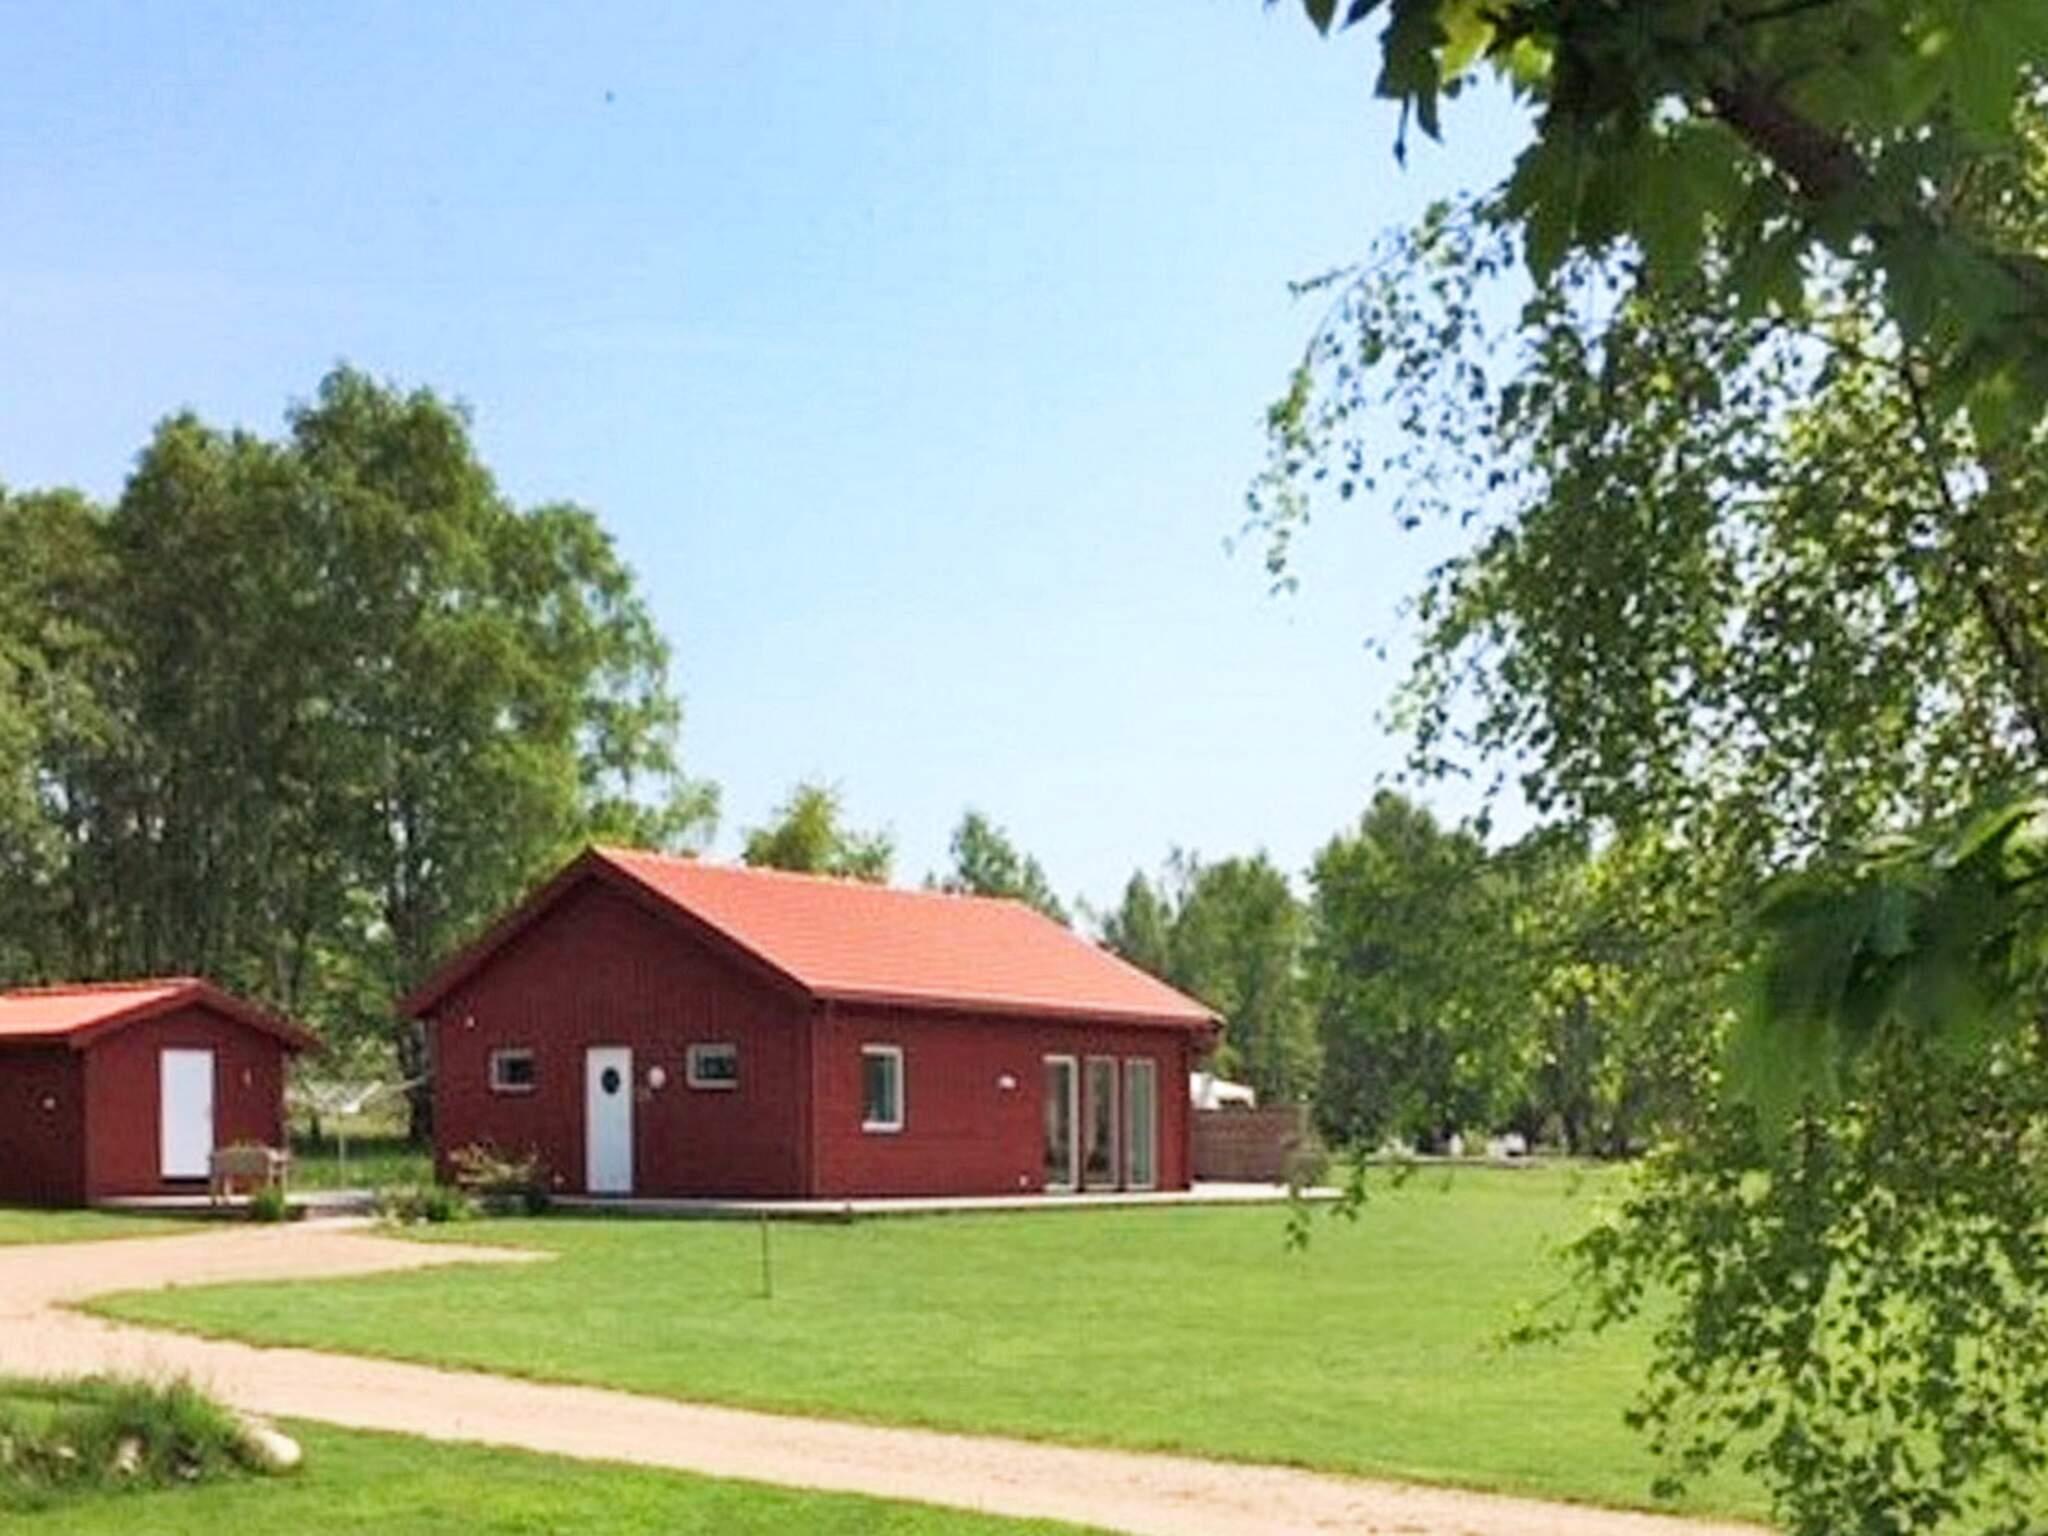 Ferienhaus Degeberga (2624324), Degeberga, Skane län, Südschweden, Schweden, Bild 13